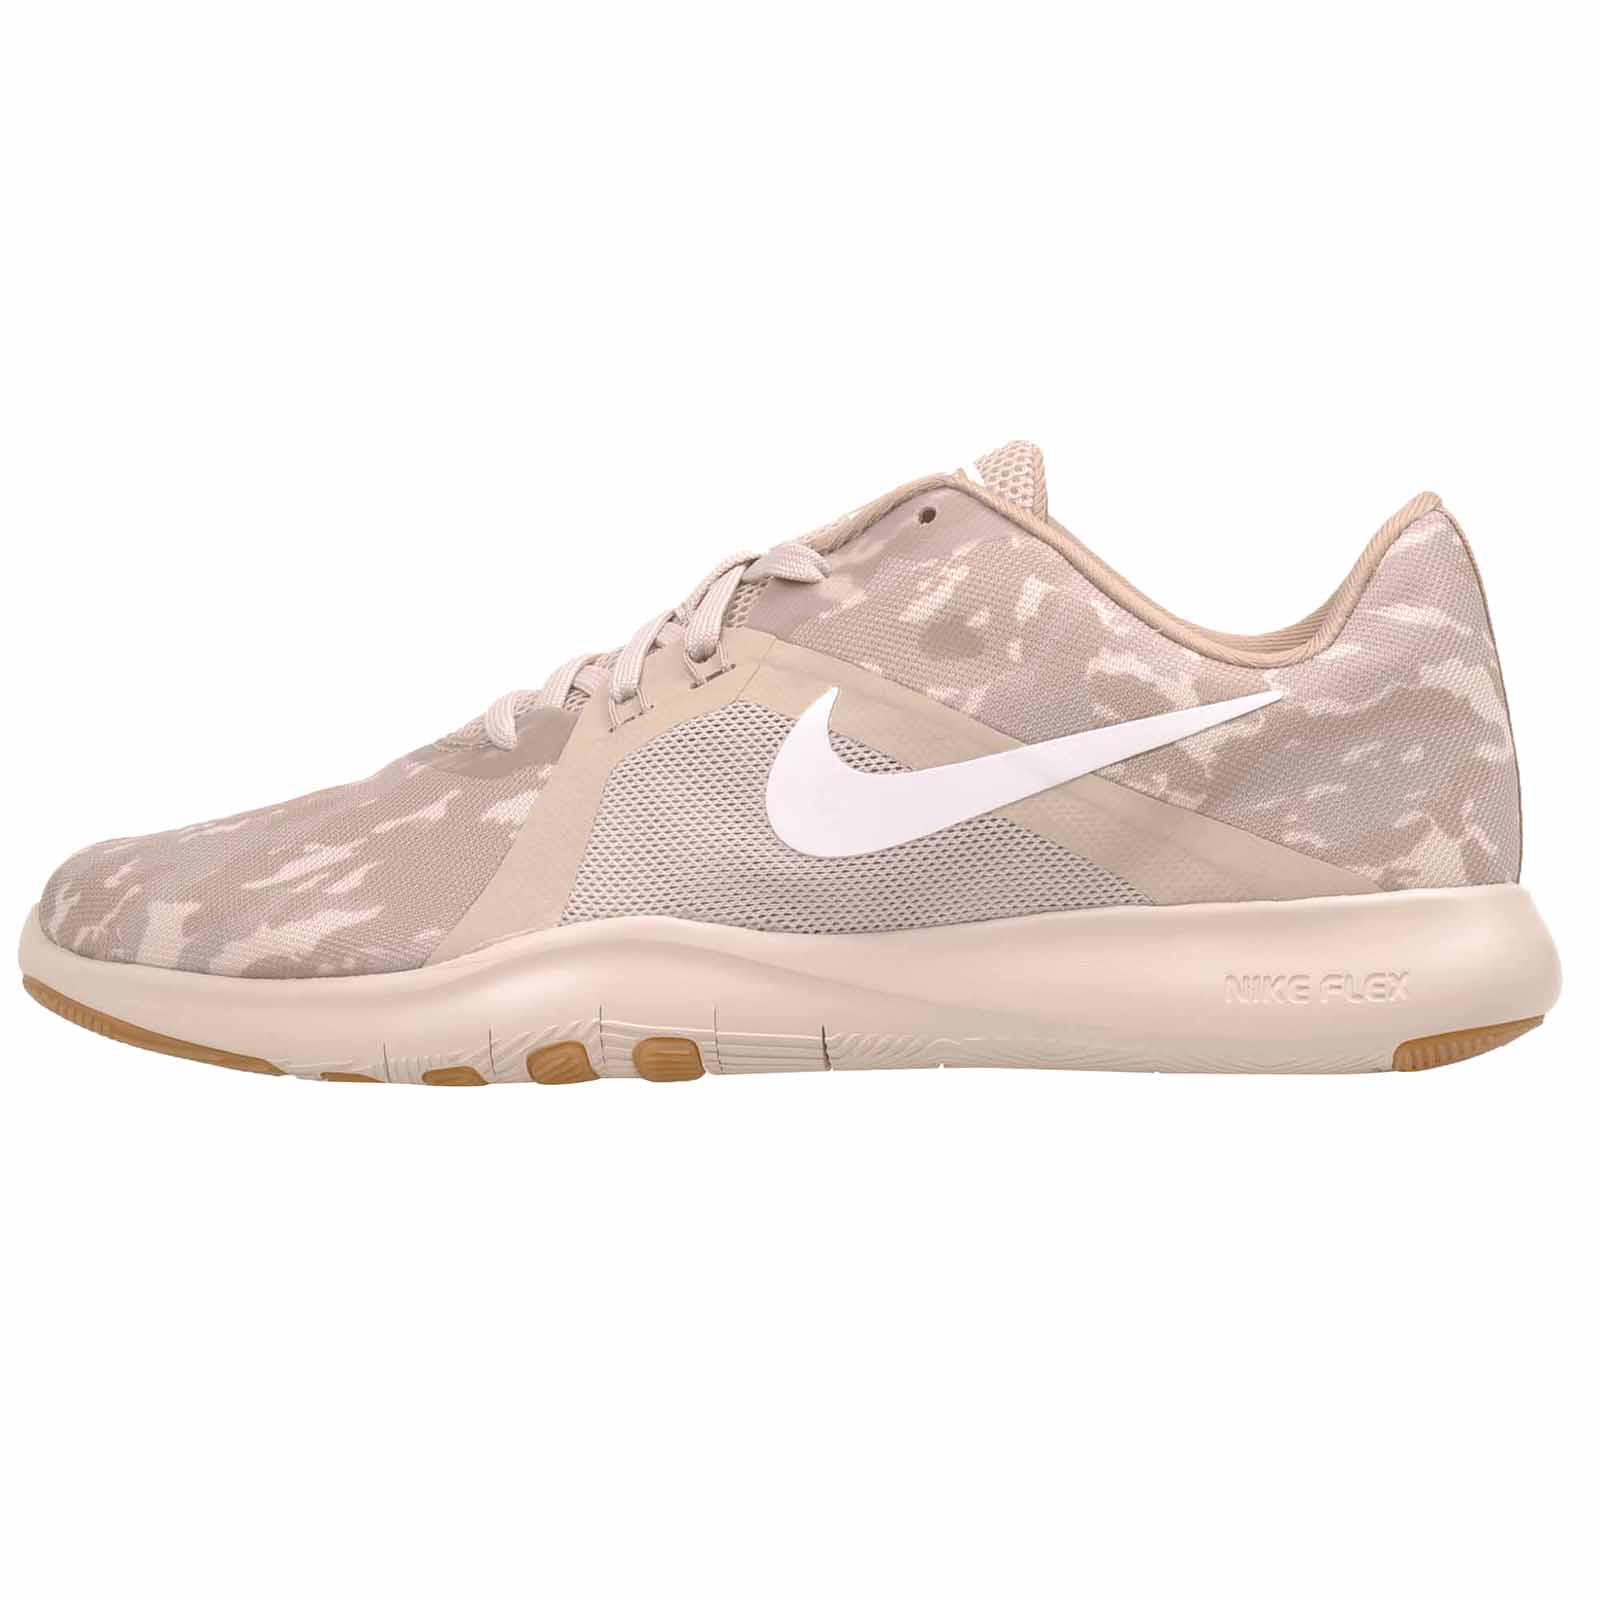 3970267d677b Details about Nike W Flex Trainer 8 Print Cross Training Womens Shoes  Desert Sand 924342-092